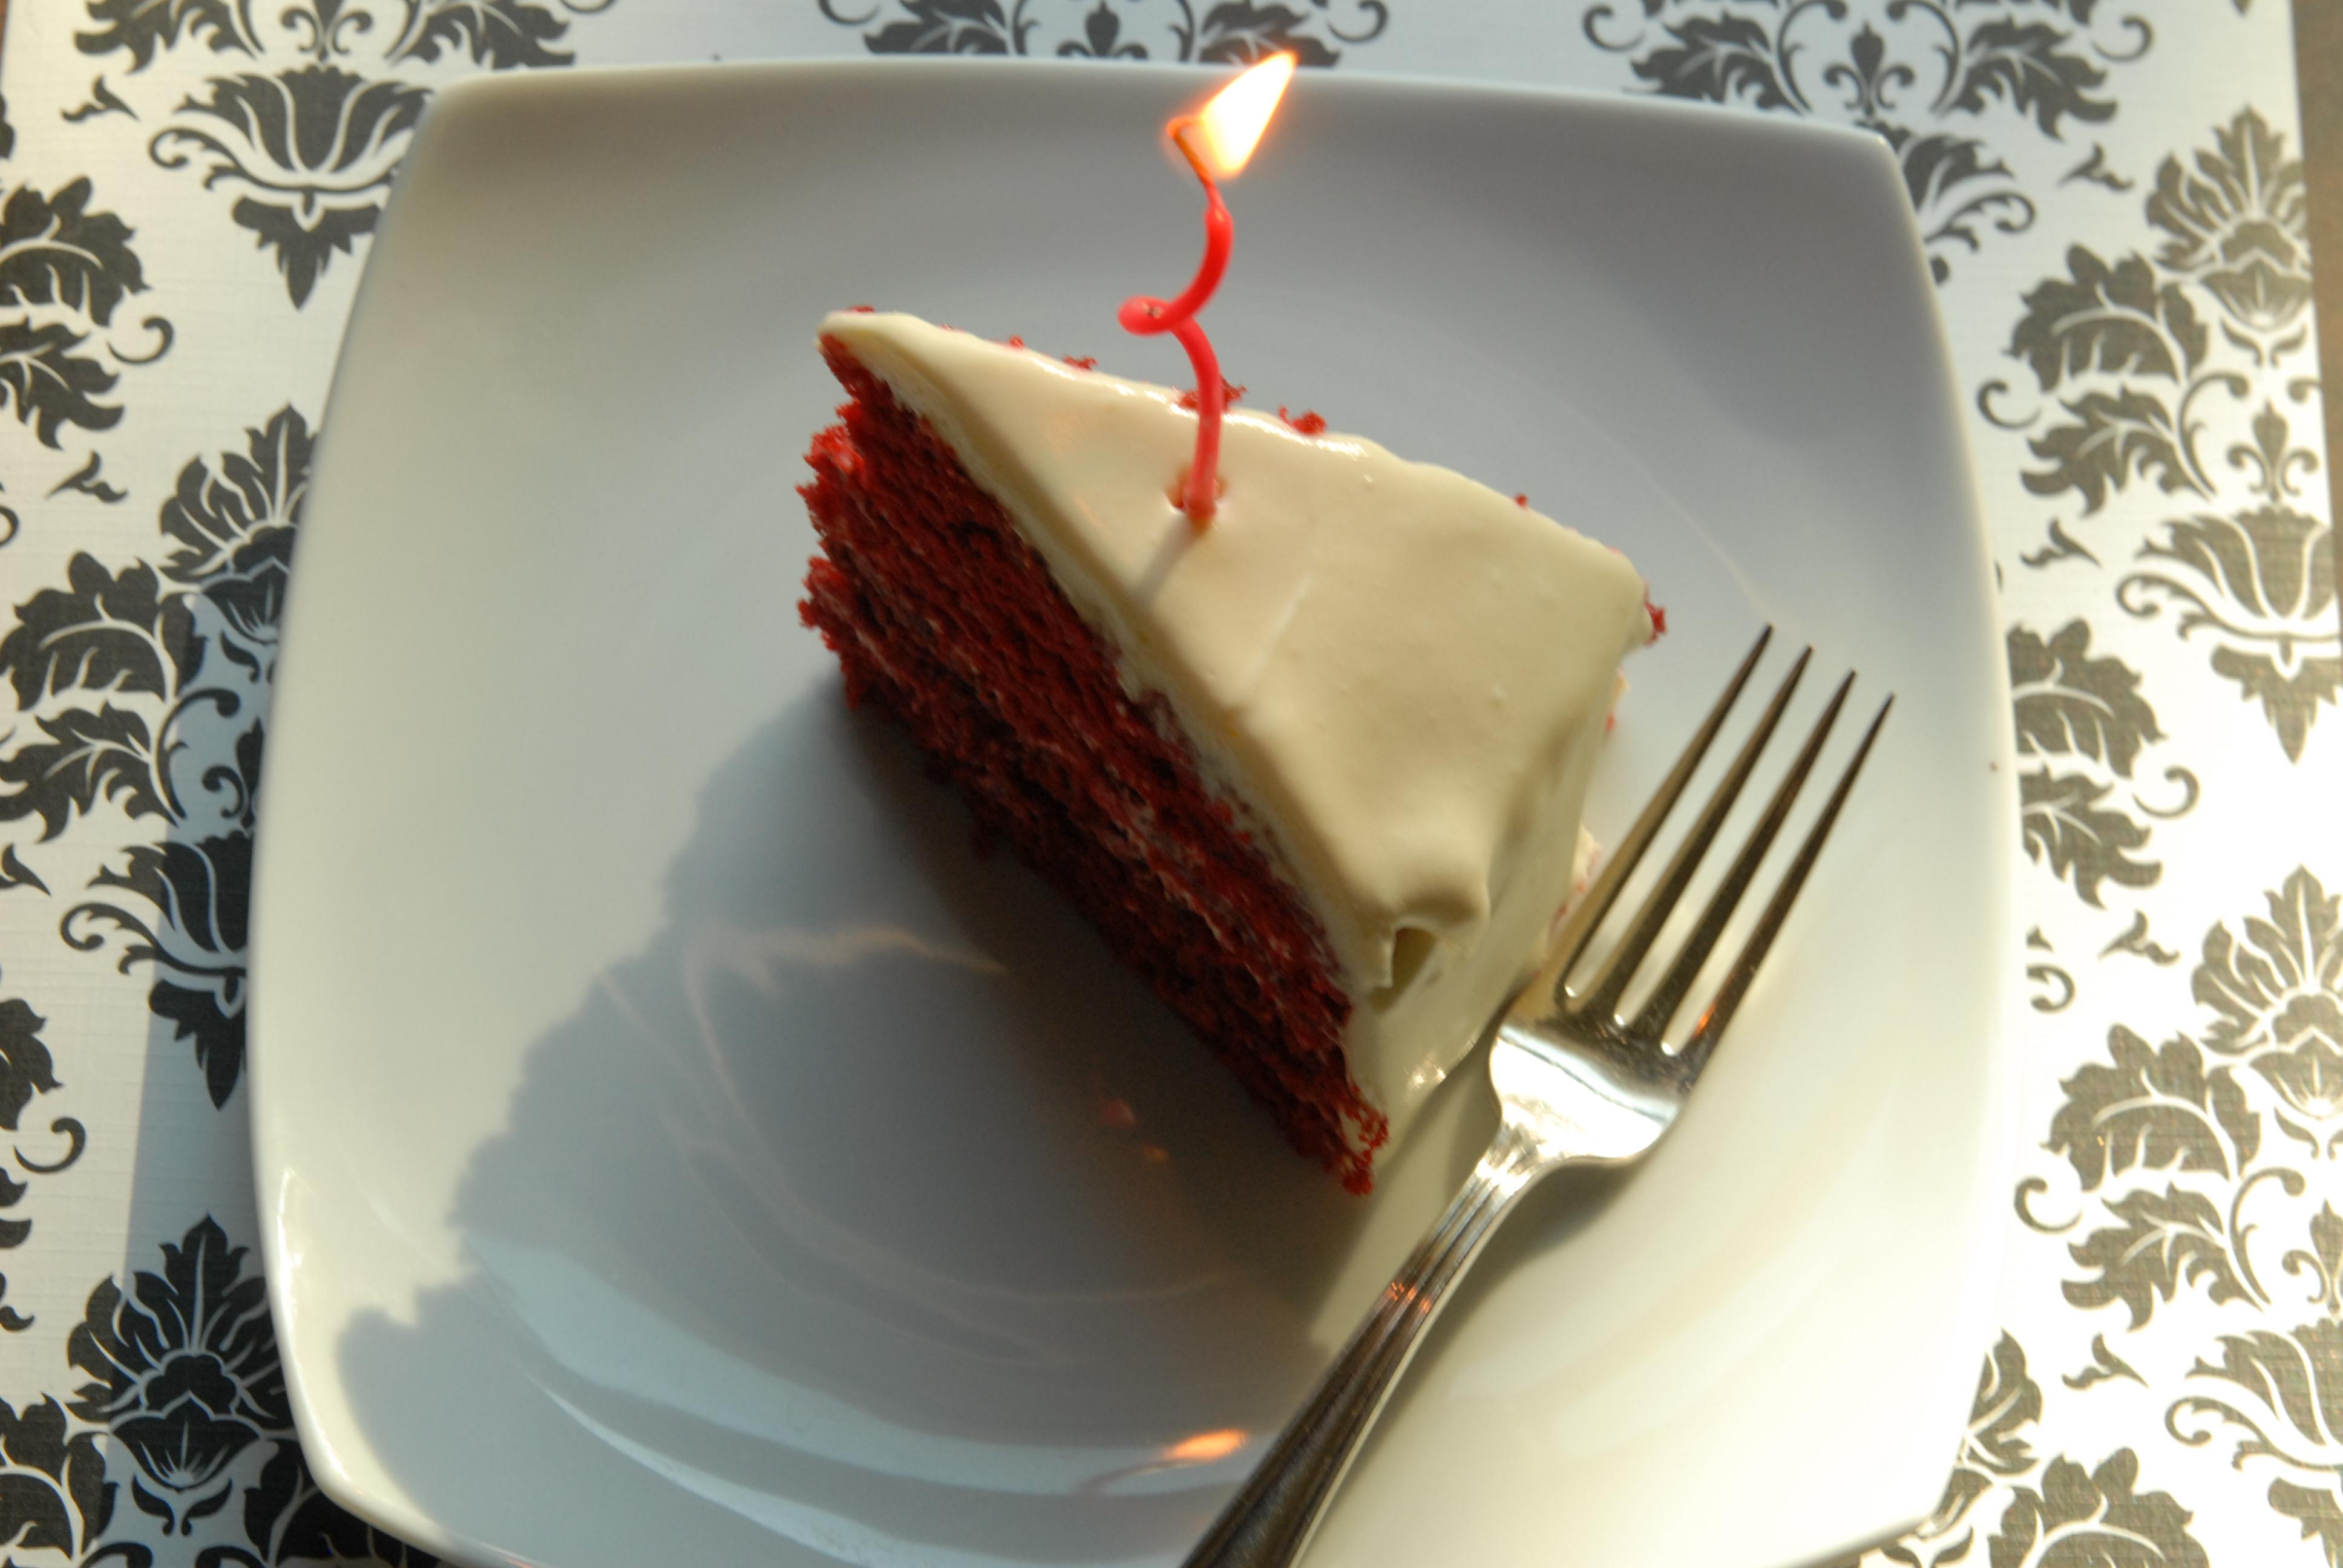 Hummingbird Cake Recipe Joy Of Baking: The Eclectic Connoisseur's Weblog